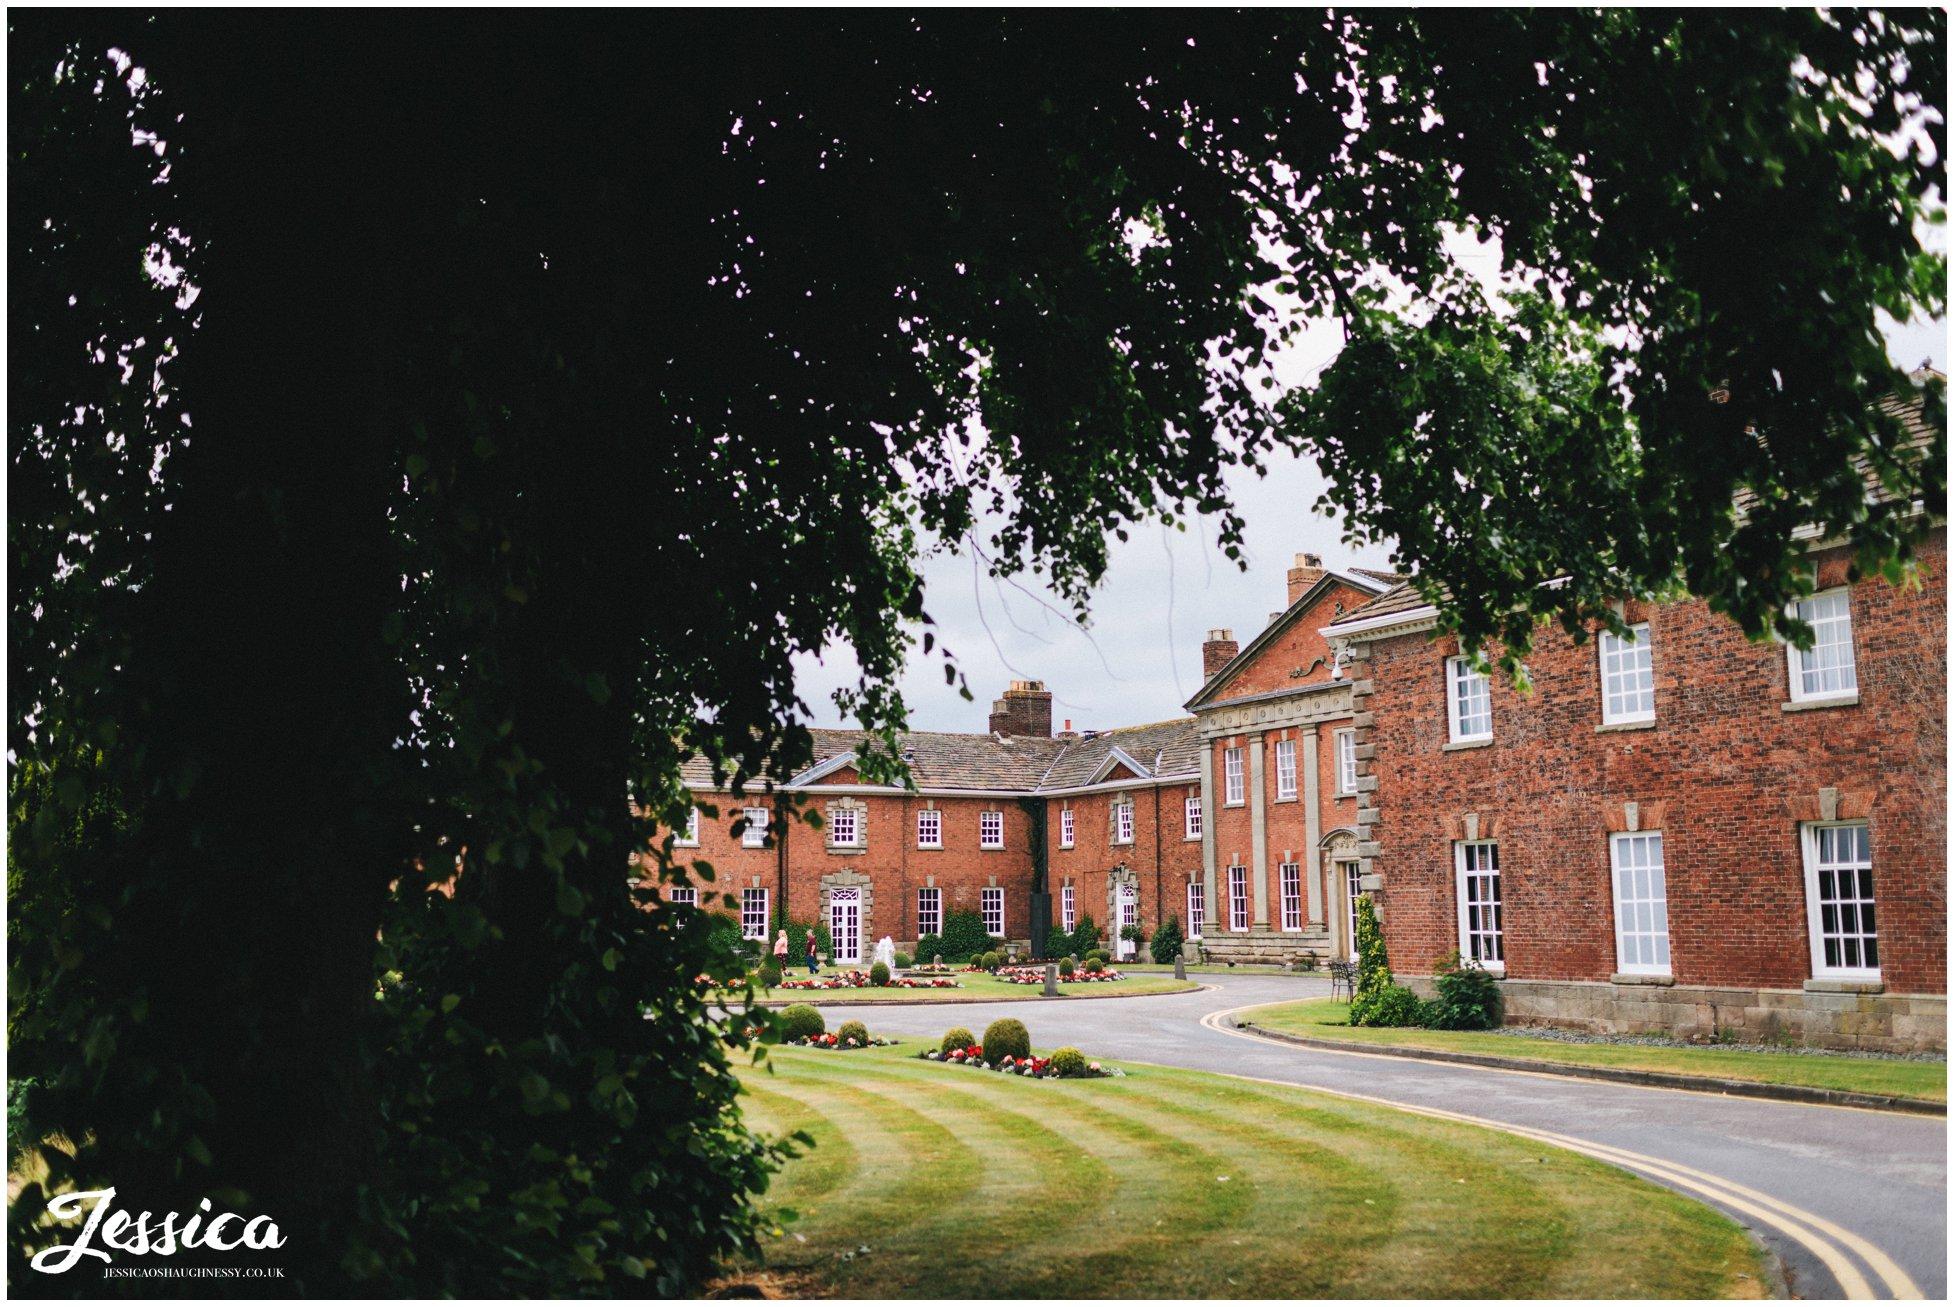 photograph of Mottram Hall through the trees